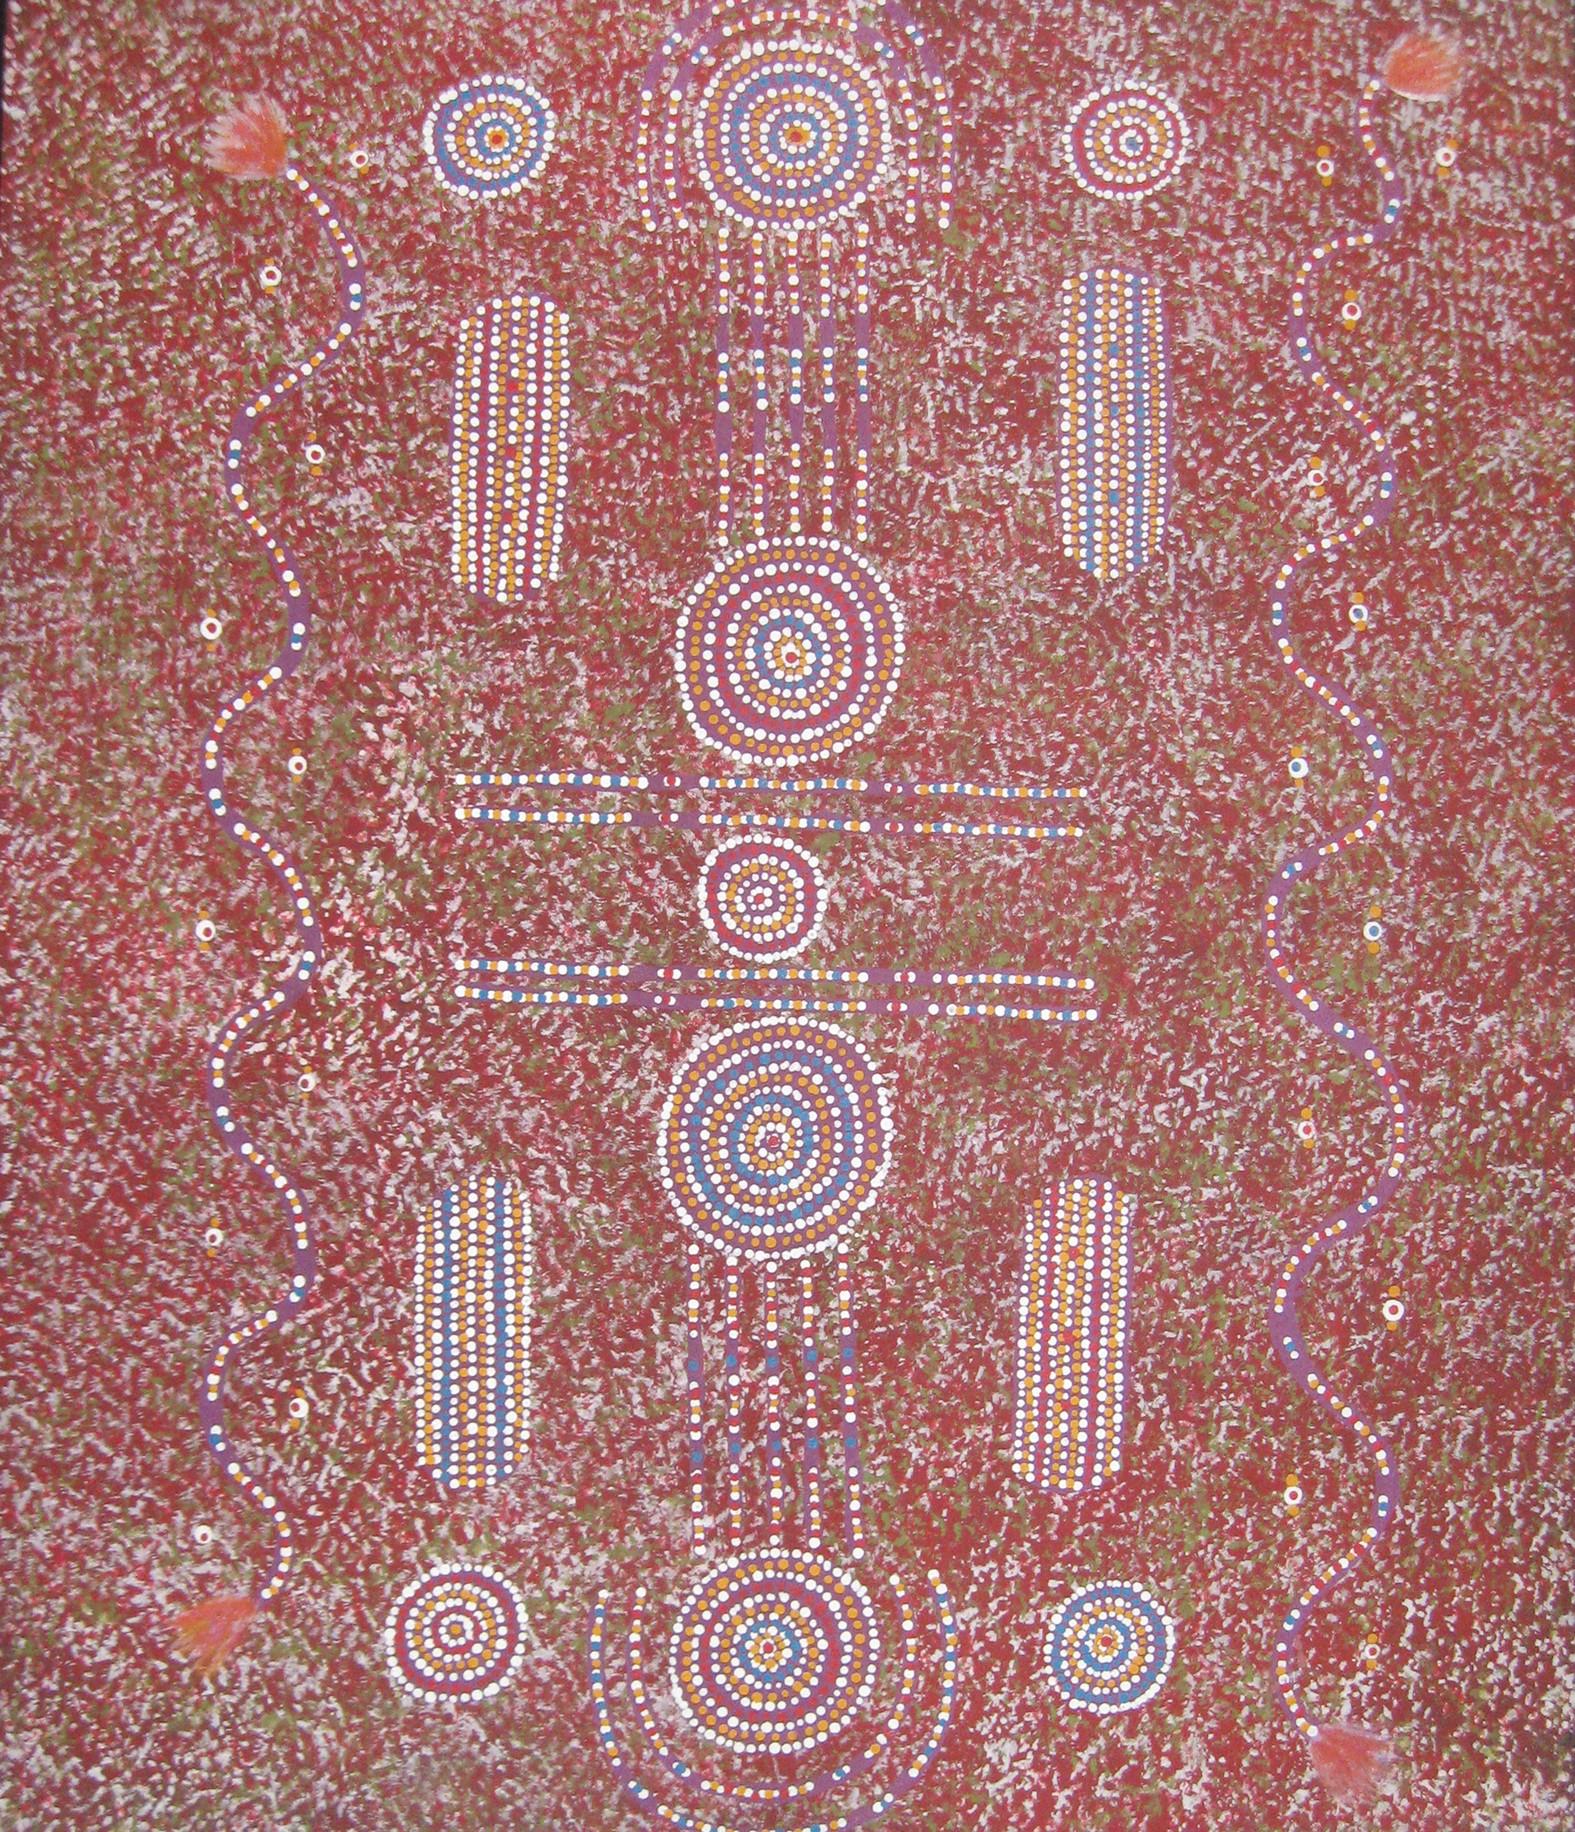 Arte aborigena australiana archivi arte contemporanea in for Arte aborigena